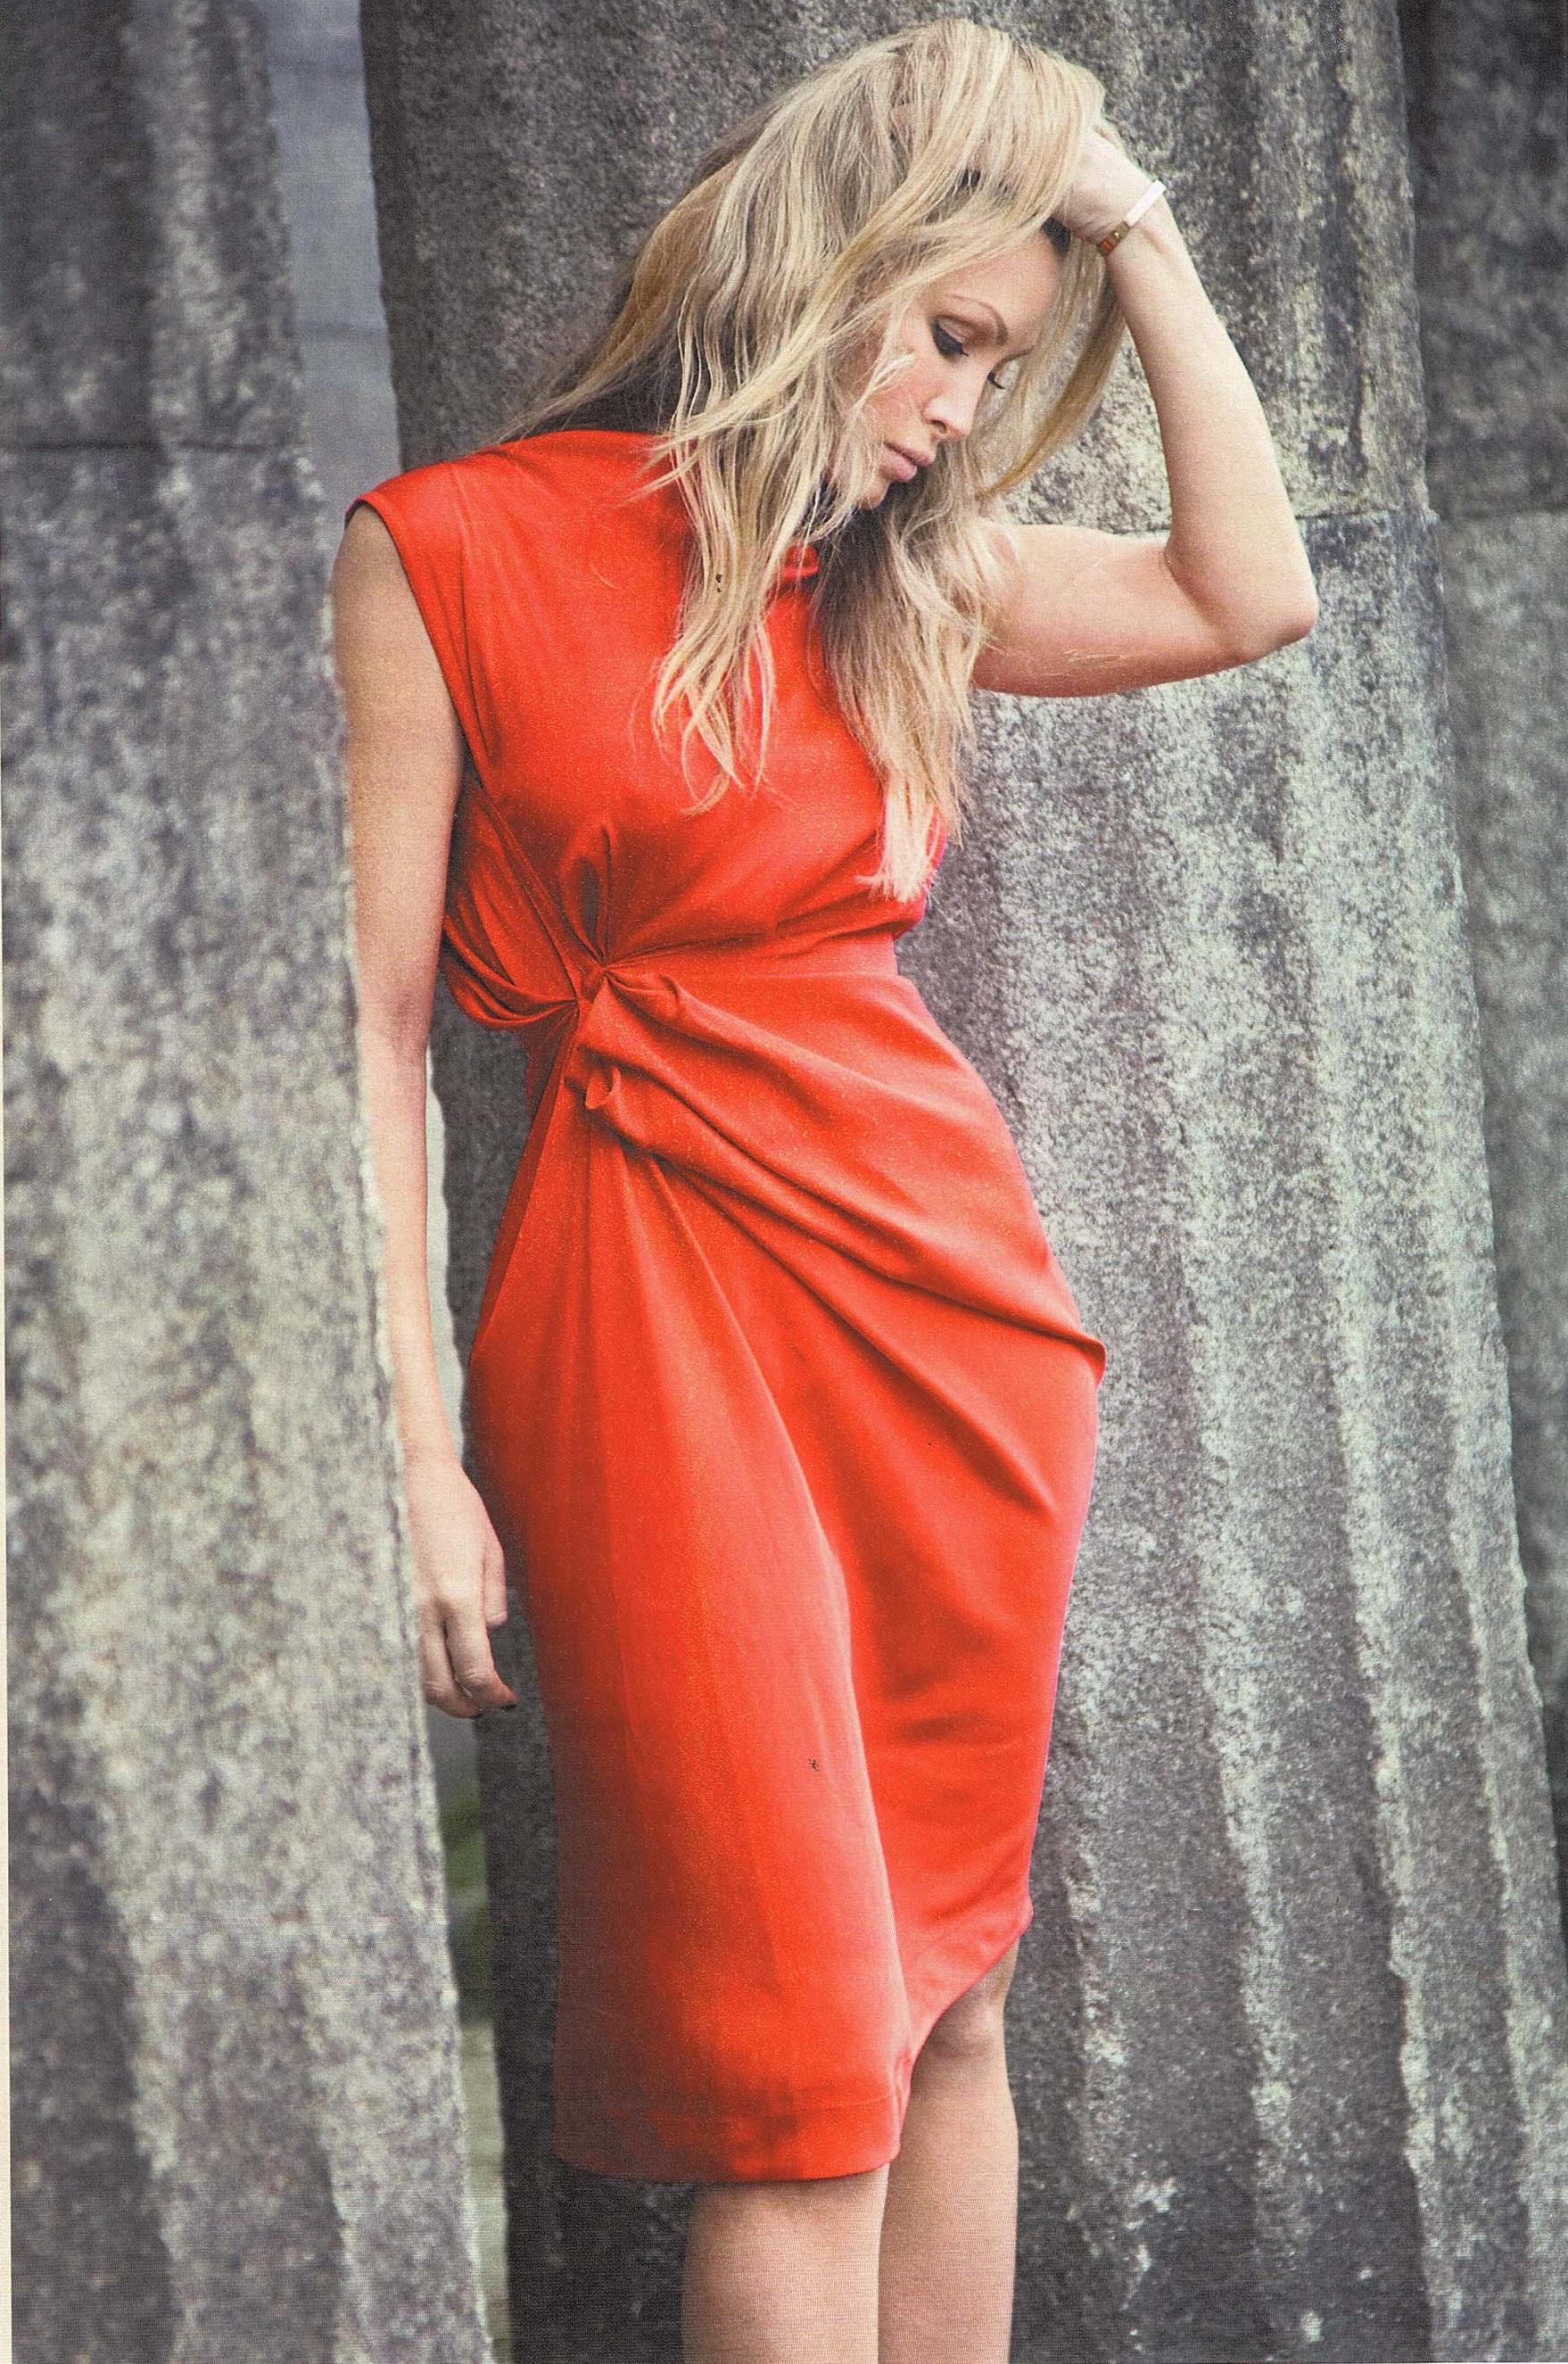 E%29+Red+dress+Life.jpg